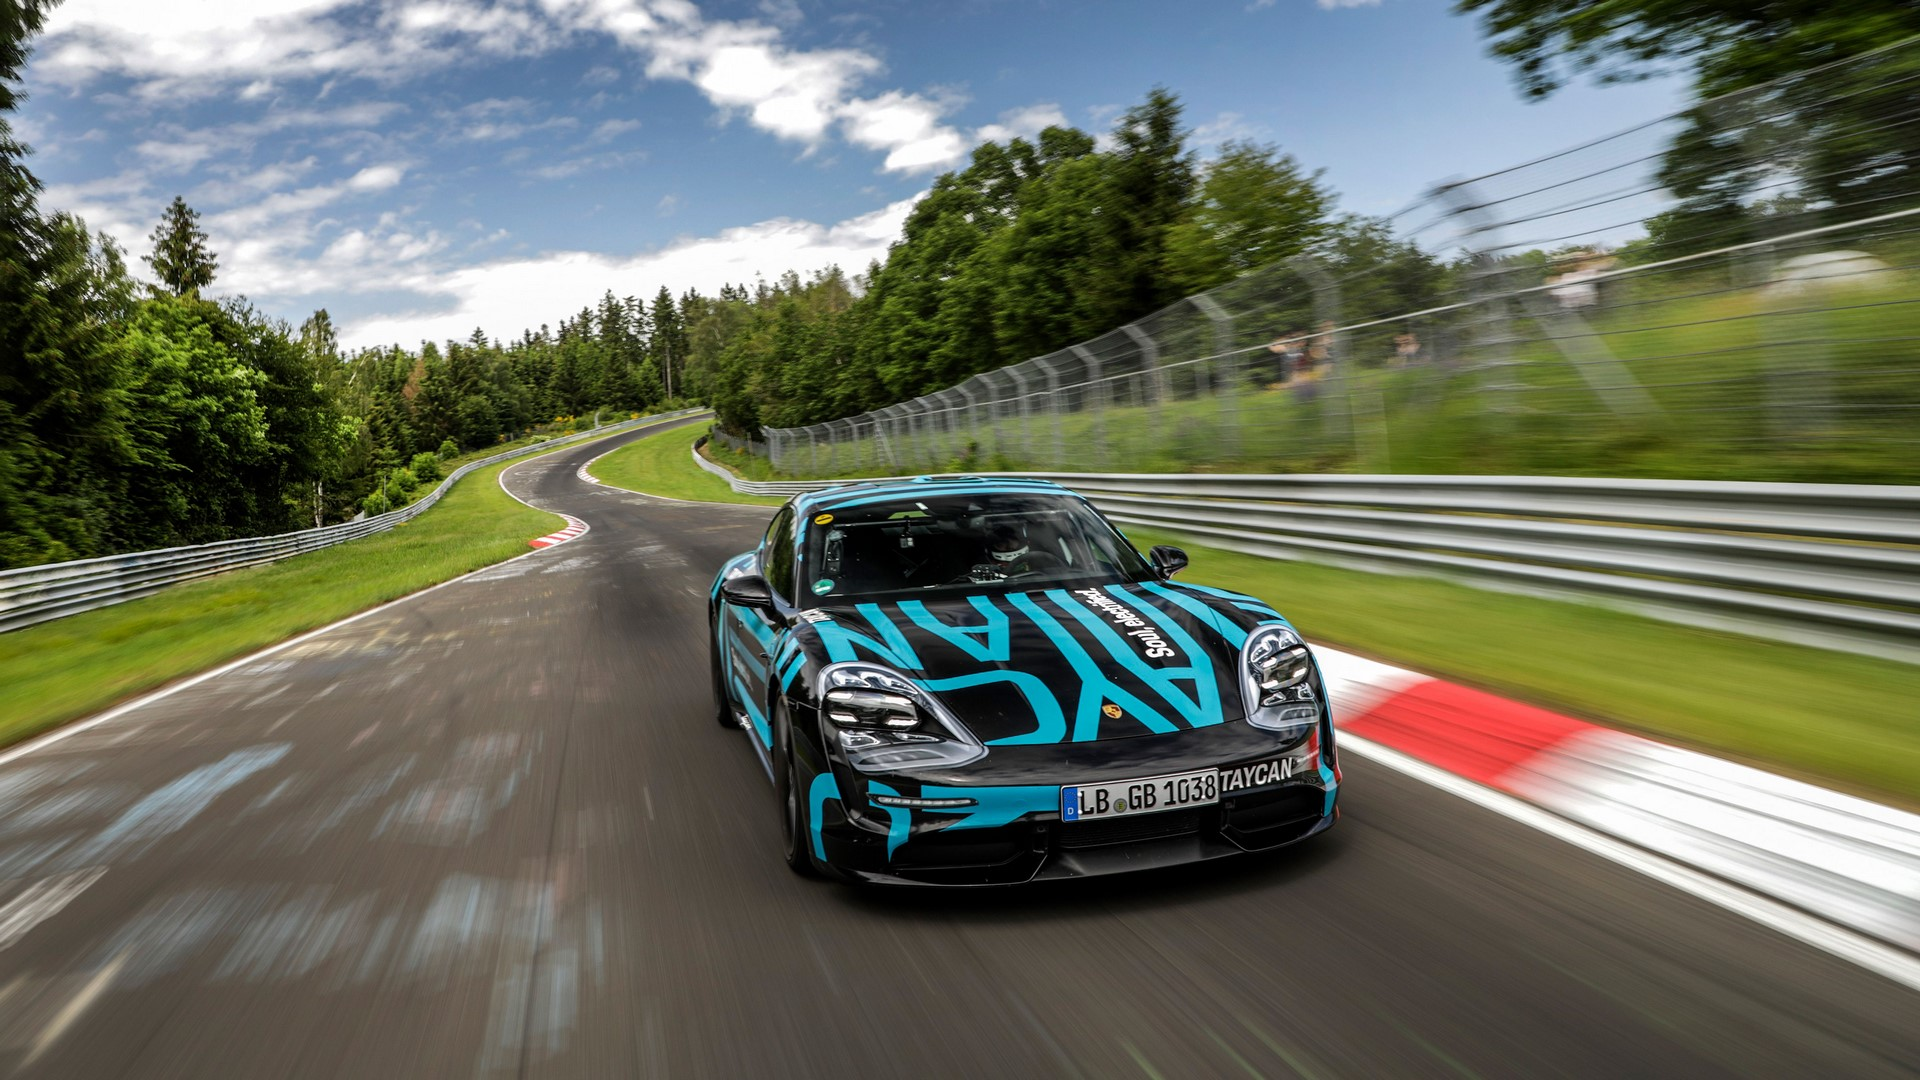 Porsche-Taycan-Nurburgring-record-10